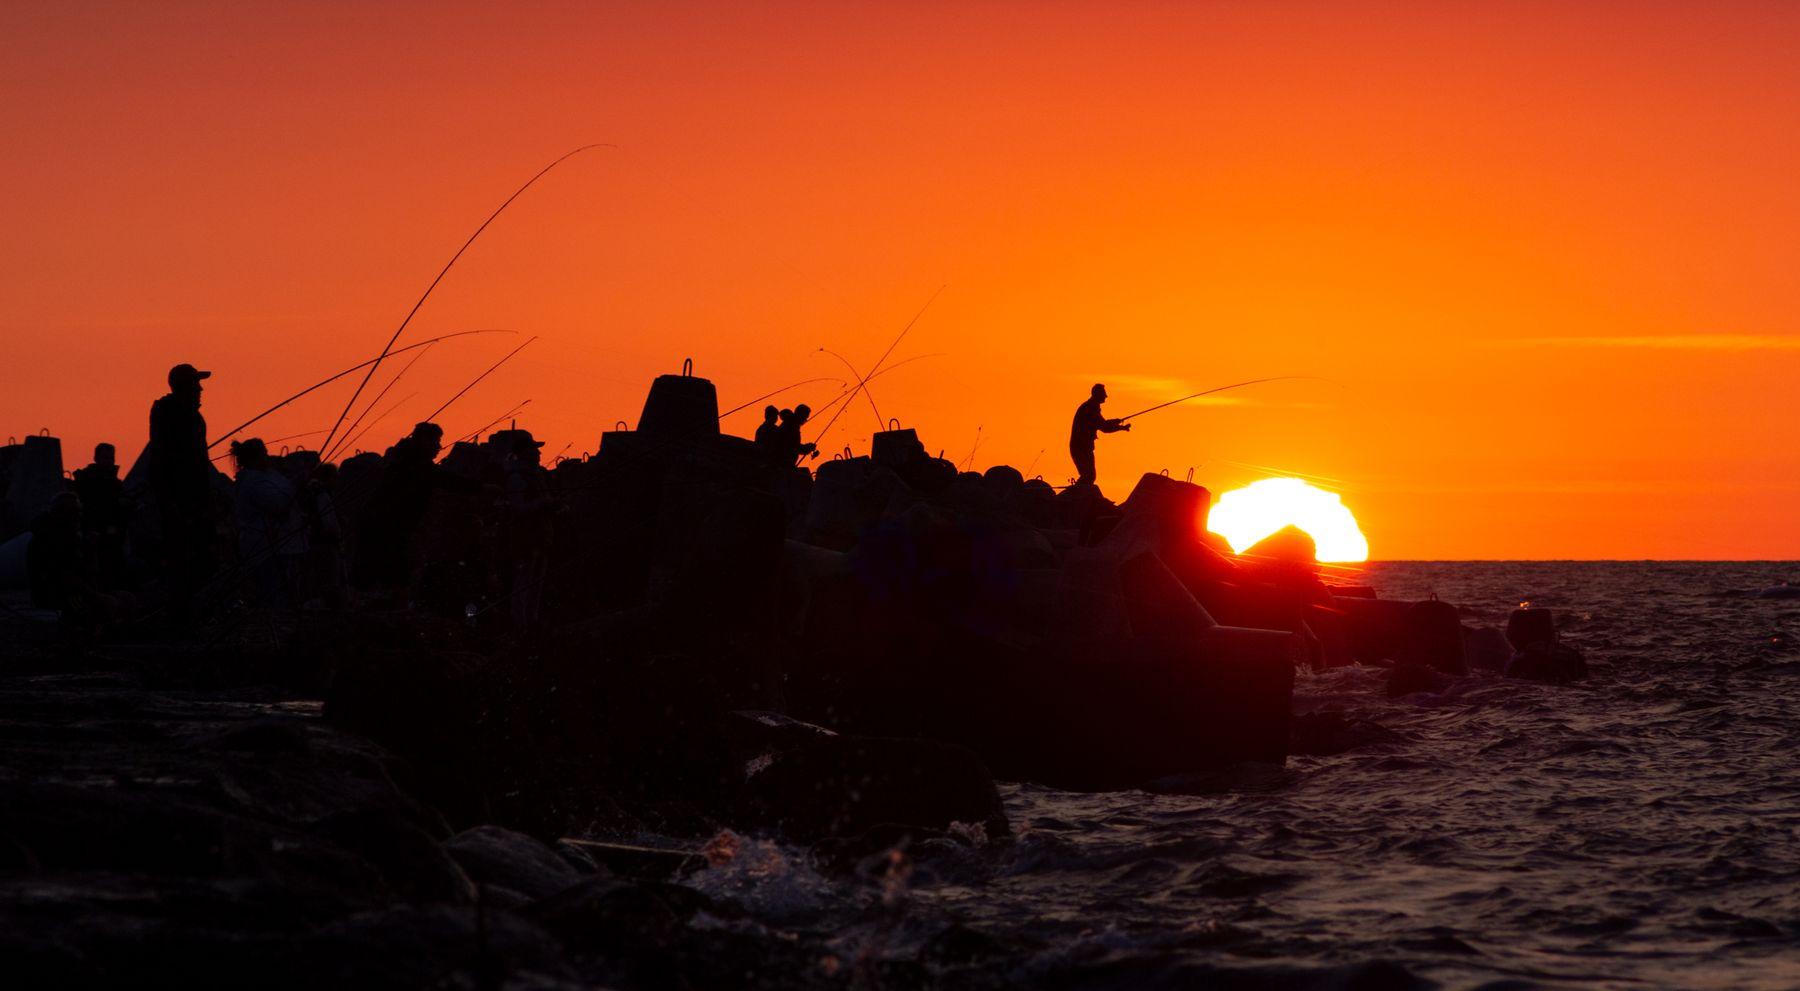 Ловцы рыбаки балтийск рыбалка море закат